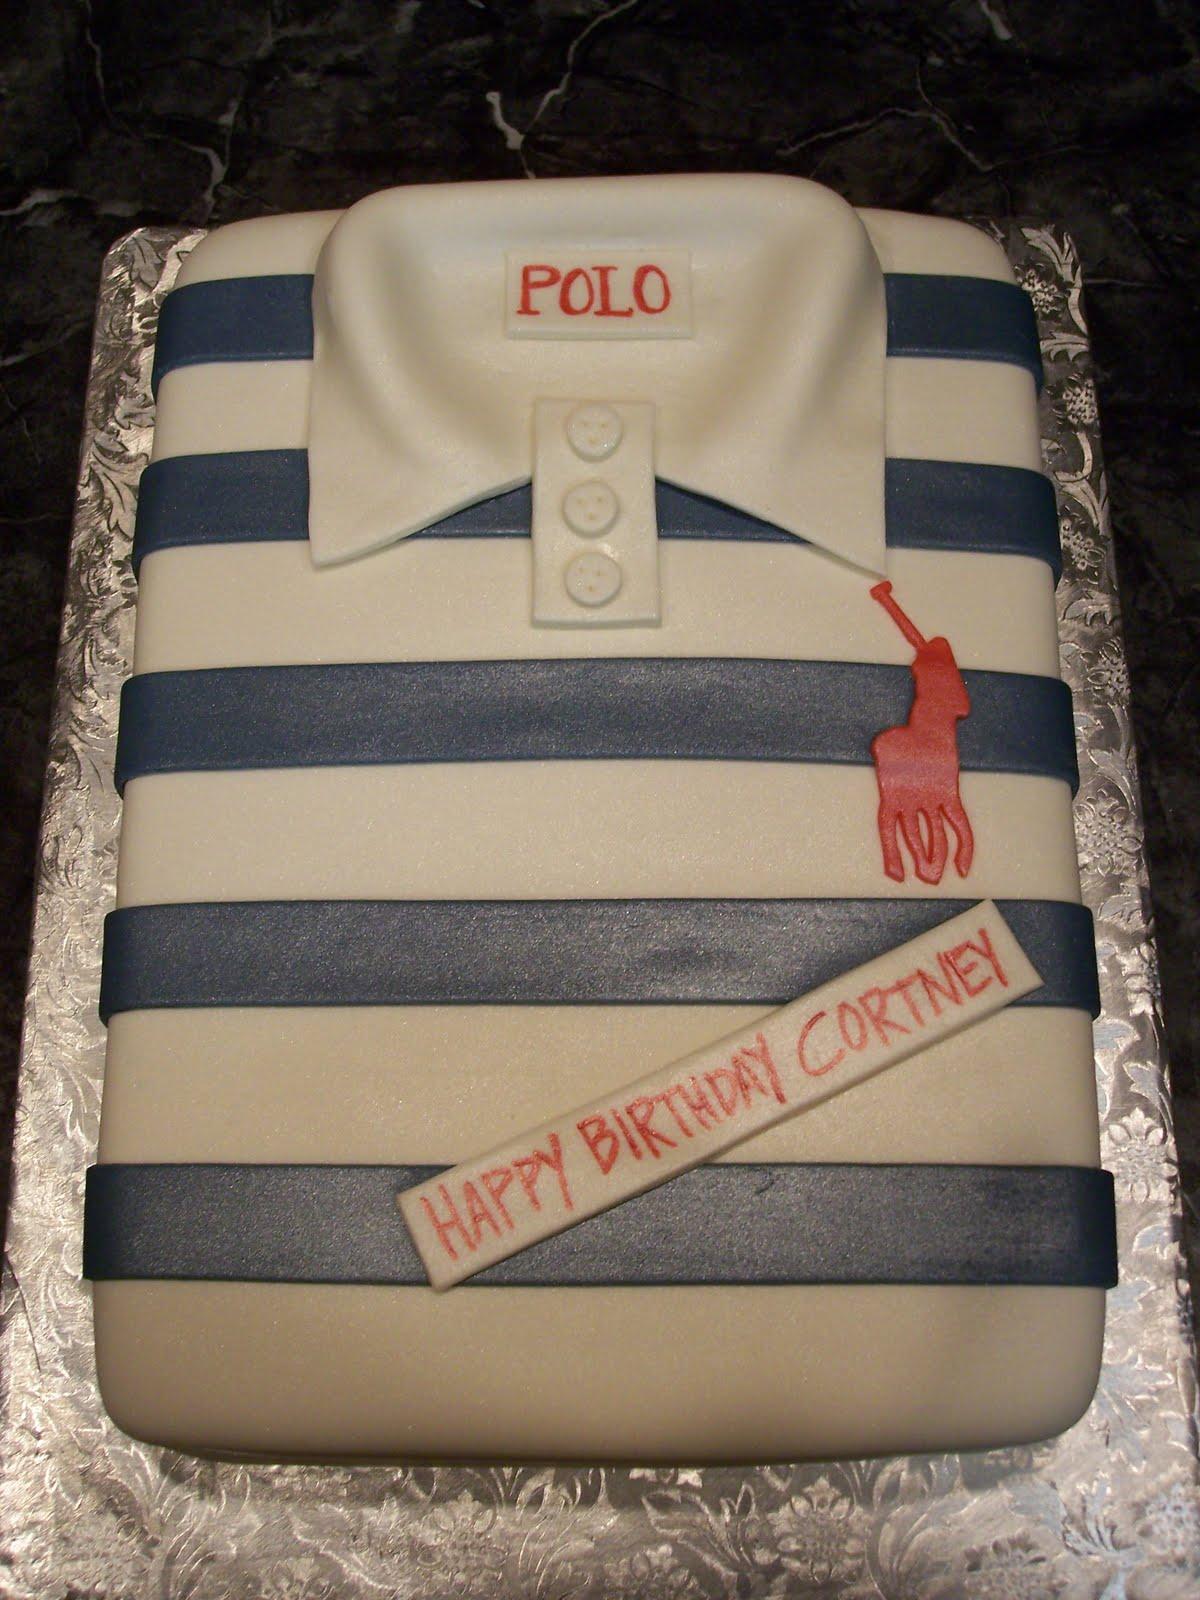 Mymonicakes Polo Shirt Cake